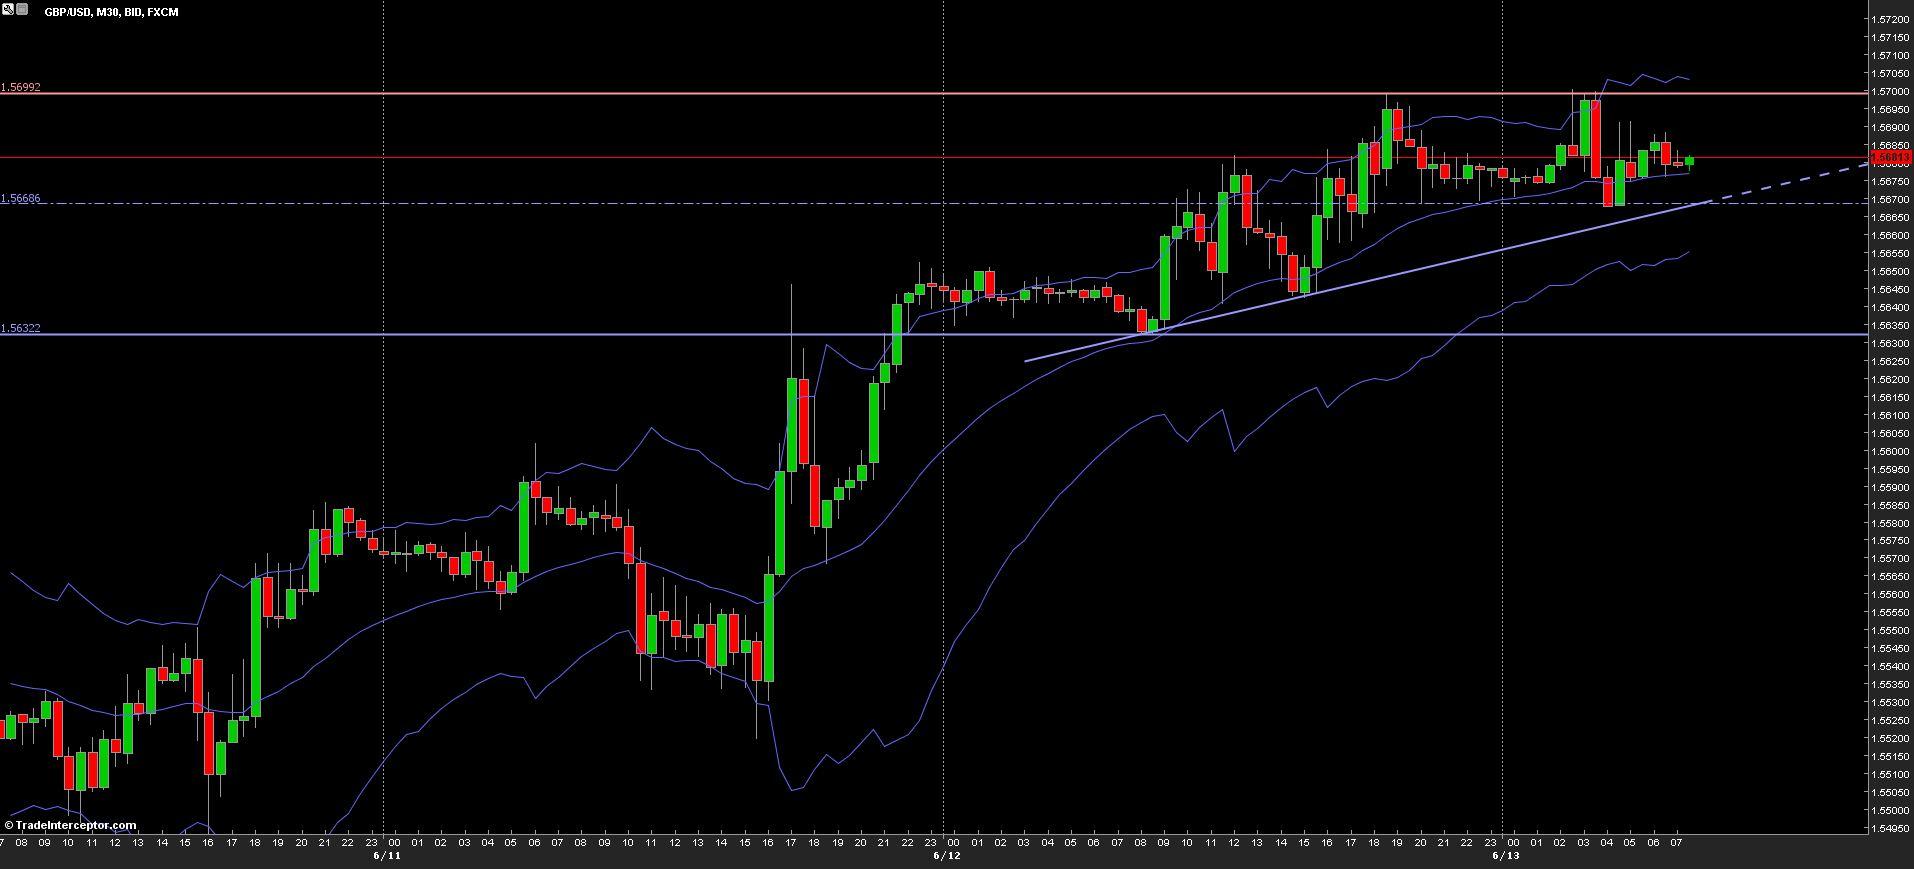 GBP/USD Chart 13/06/2013